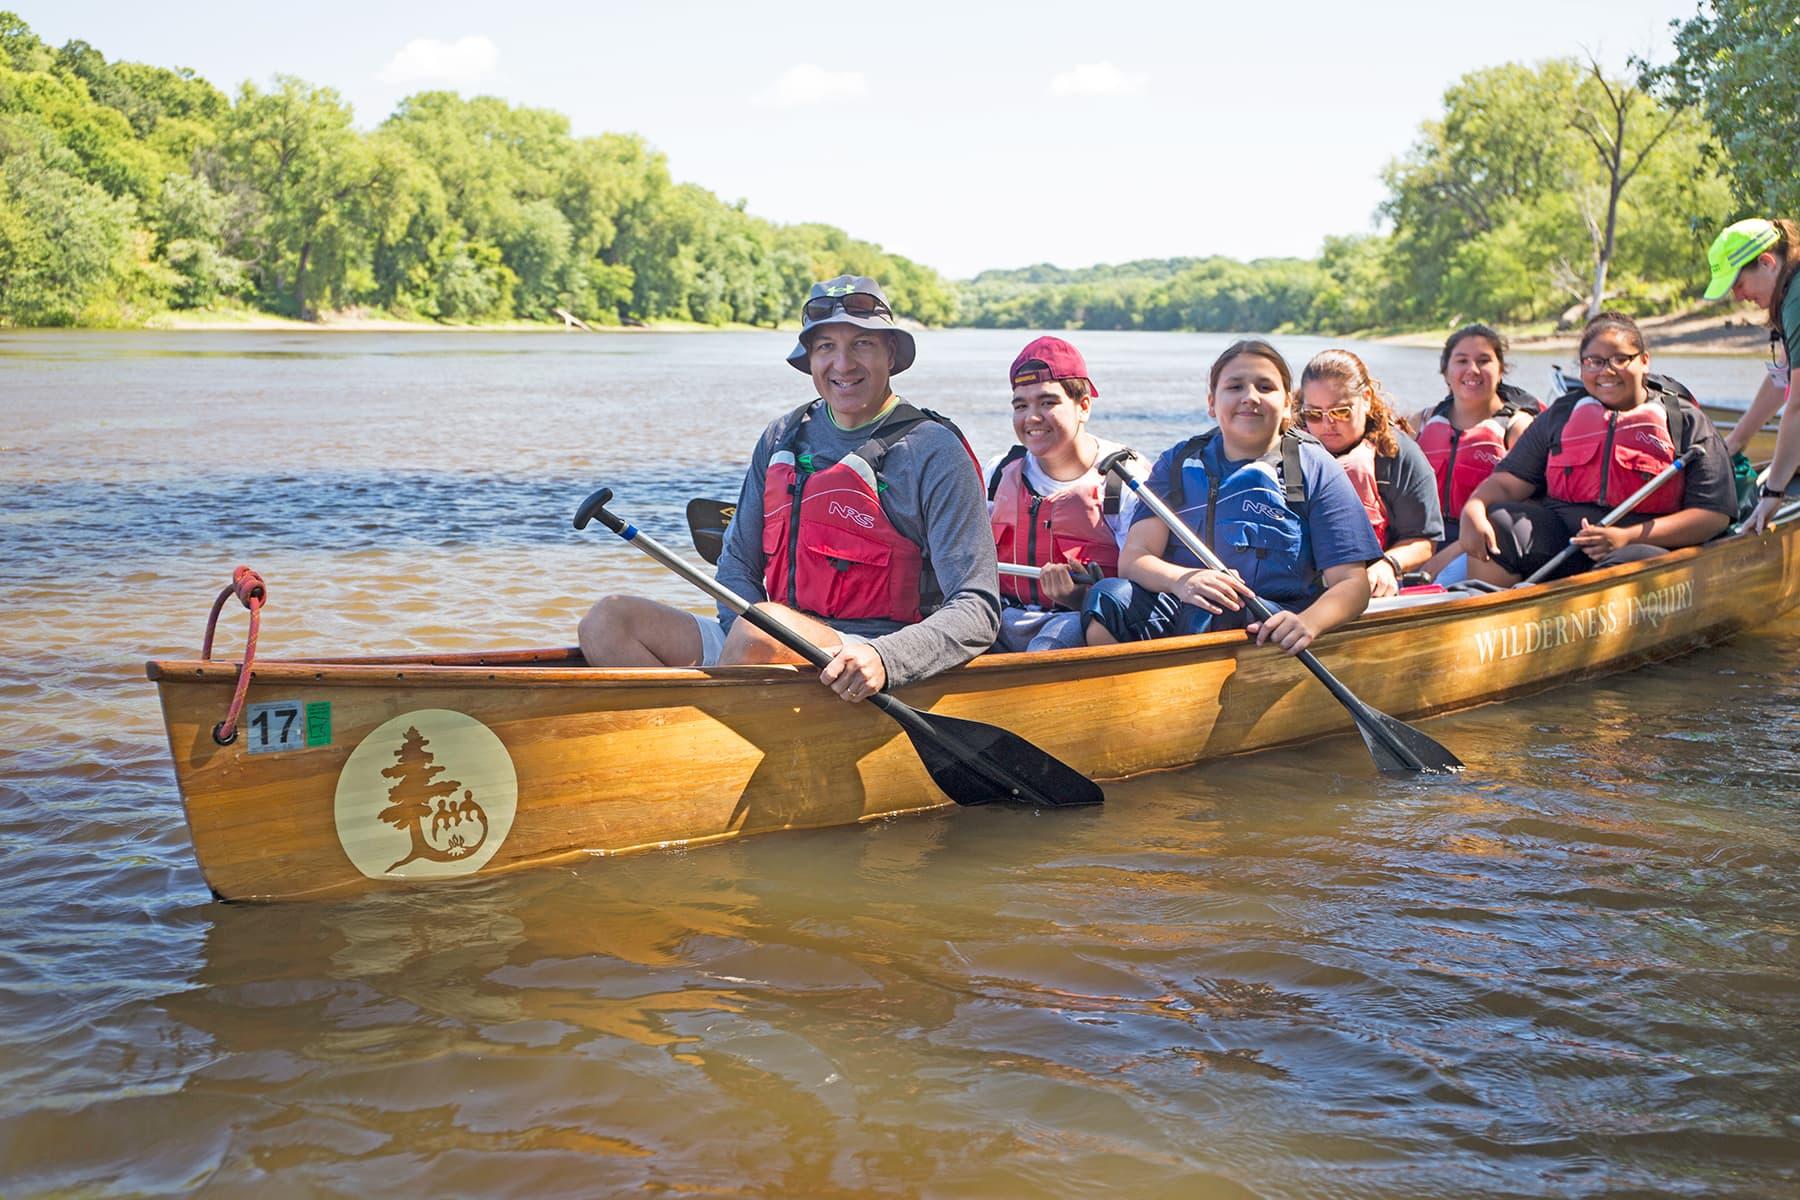 Superintendent Joe Gothard paddles in a Voyageur